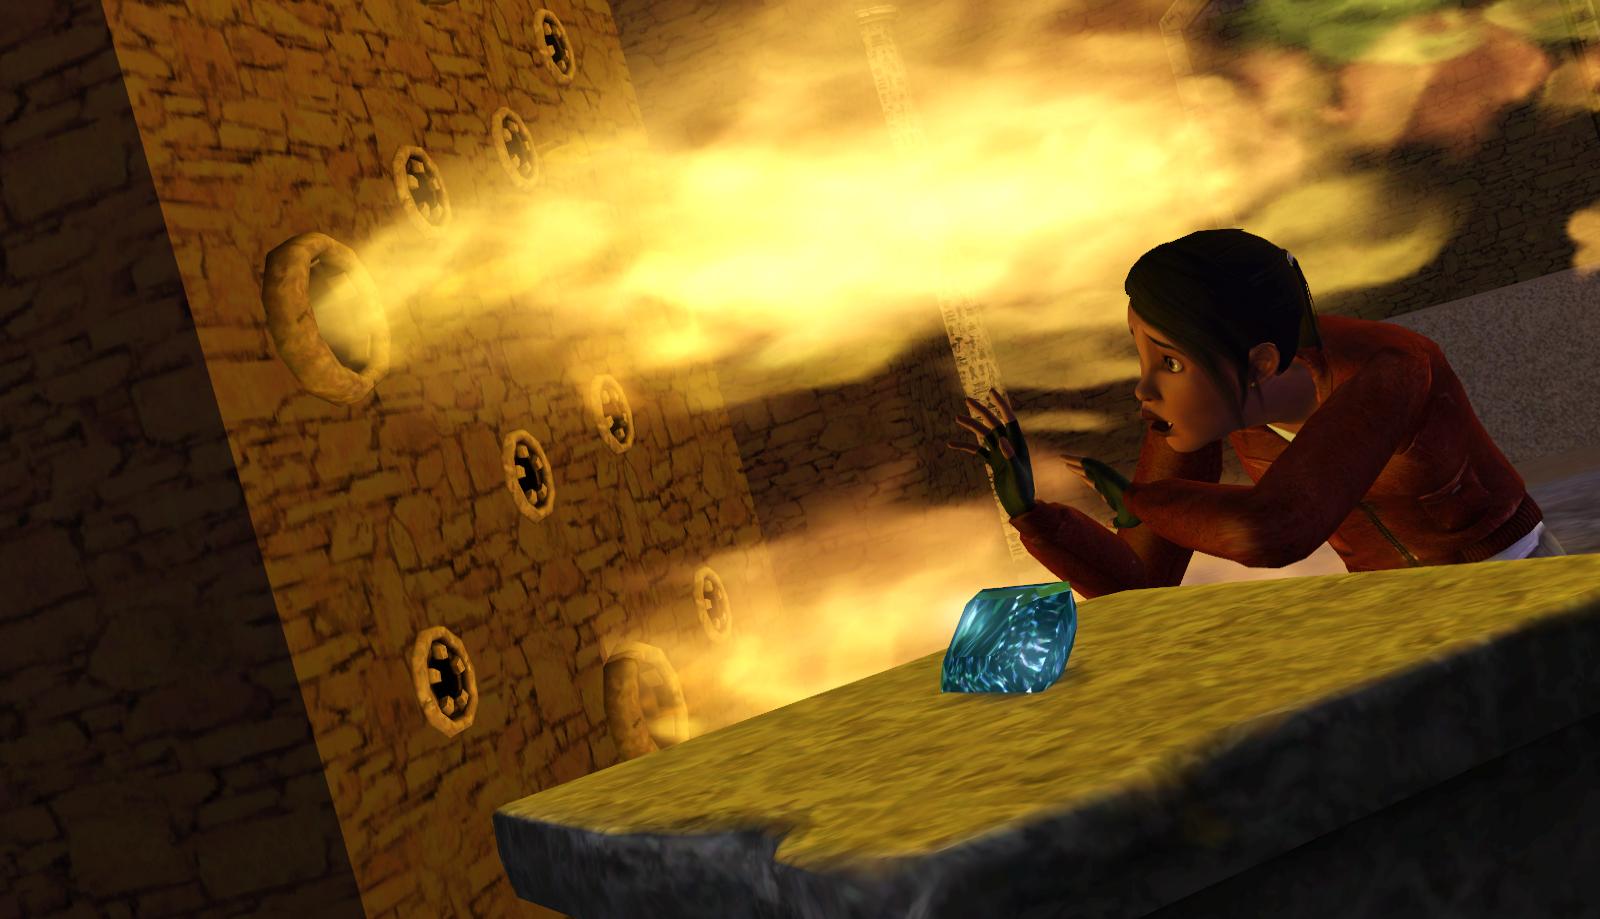 Les Sims 3: Destination Aventure (Win - Mac) - Image 5